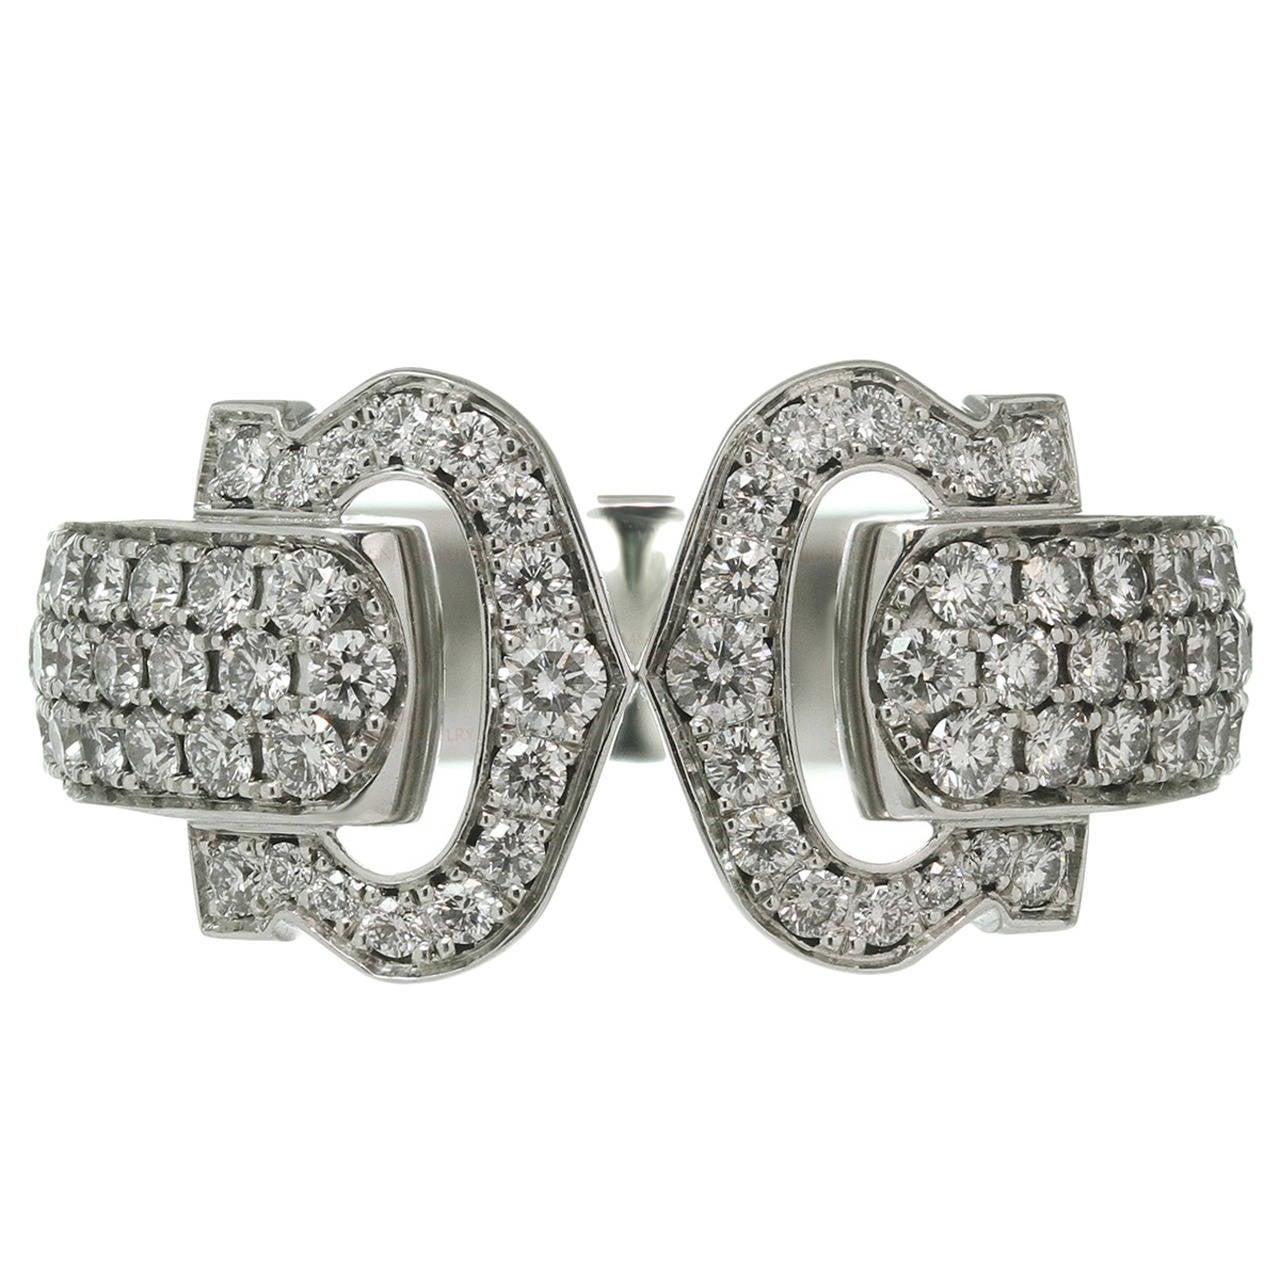 Cartier Double C Decor Ring Price